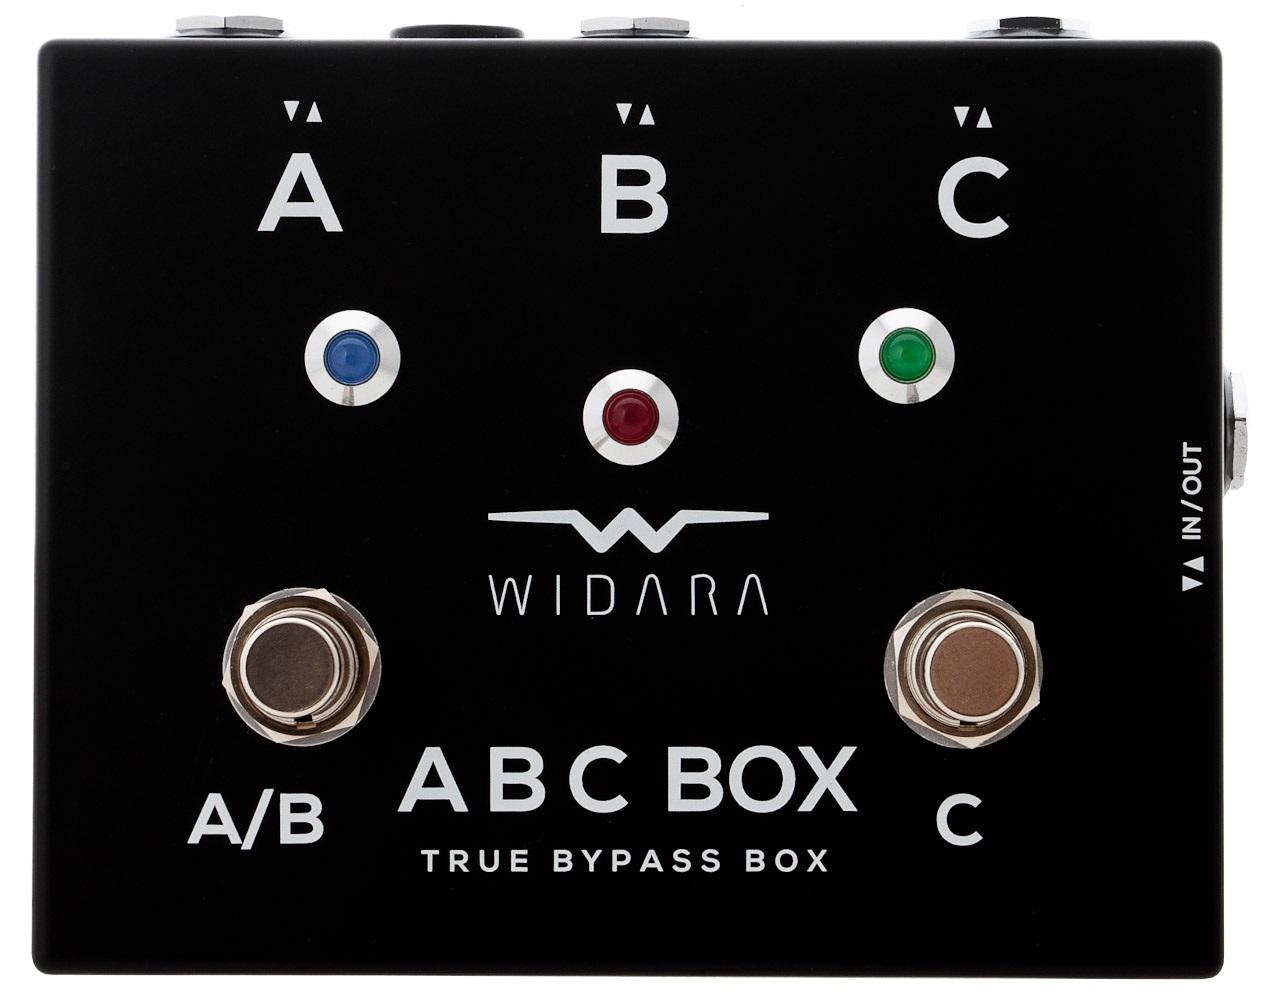 Widara ABC Box Black